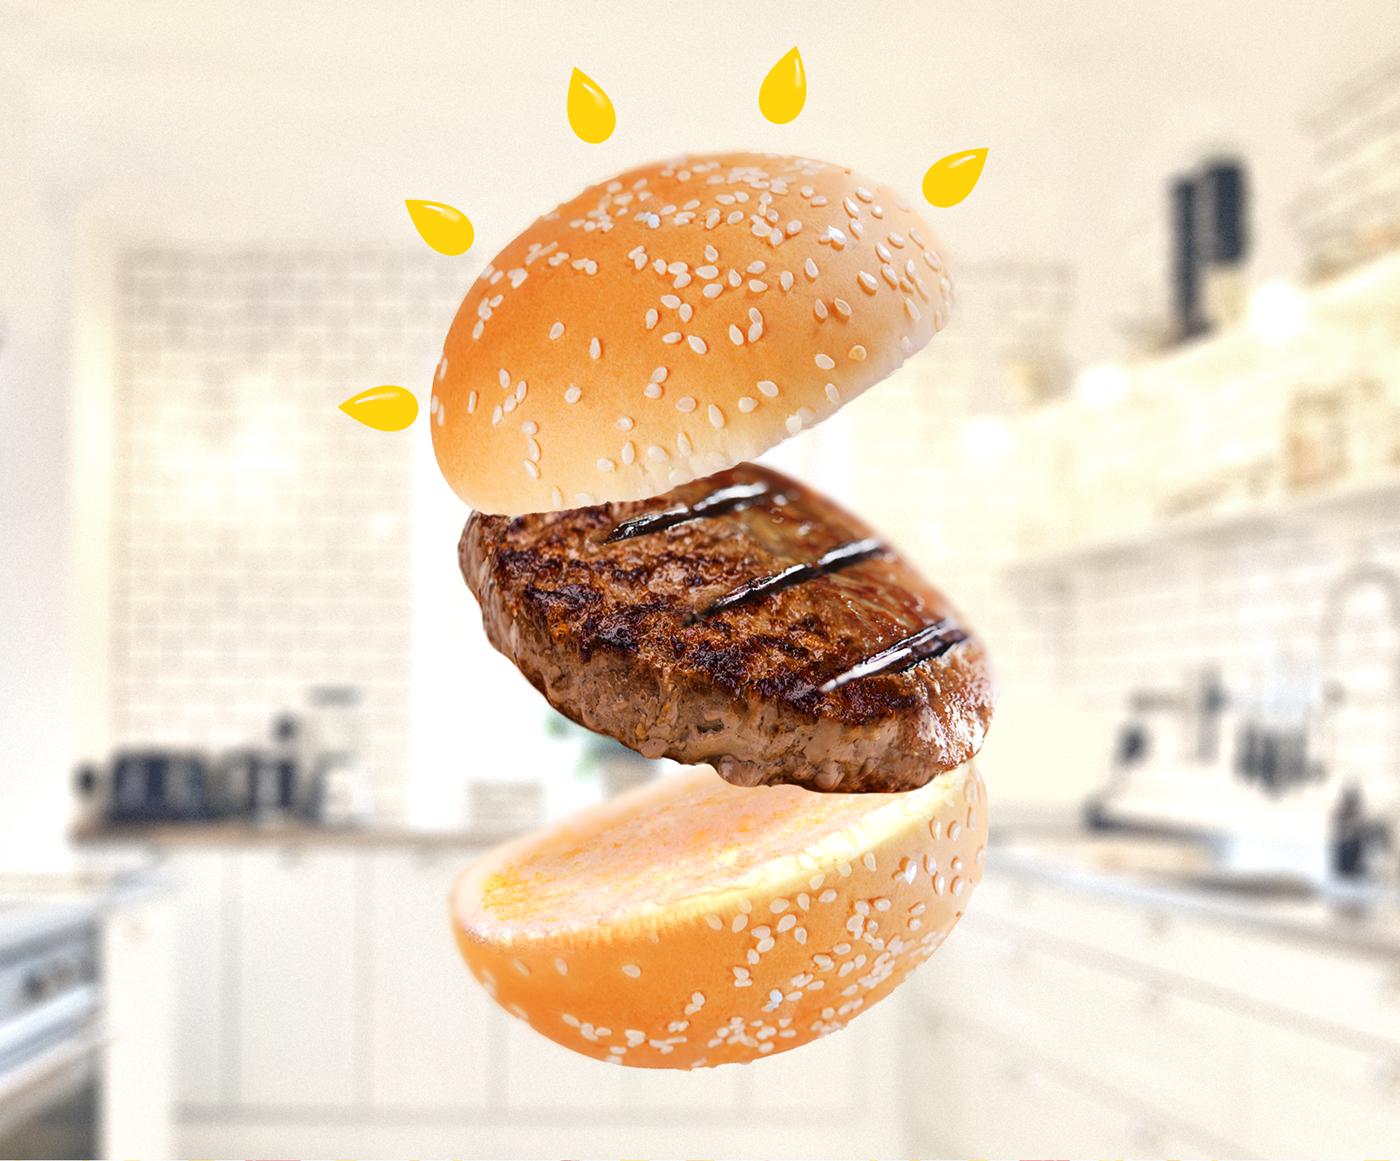 graphicdesign branding  logo identity fastfood amothdesign amoth burger bistro amothstudio